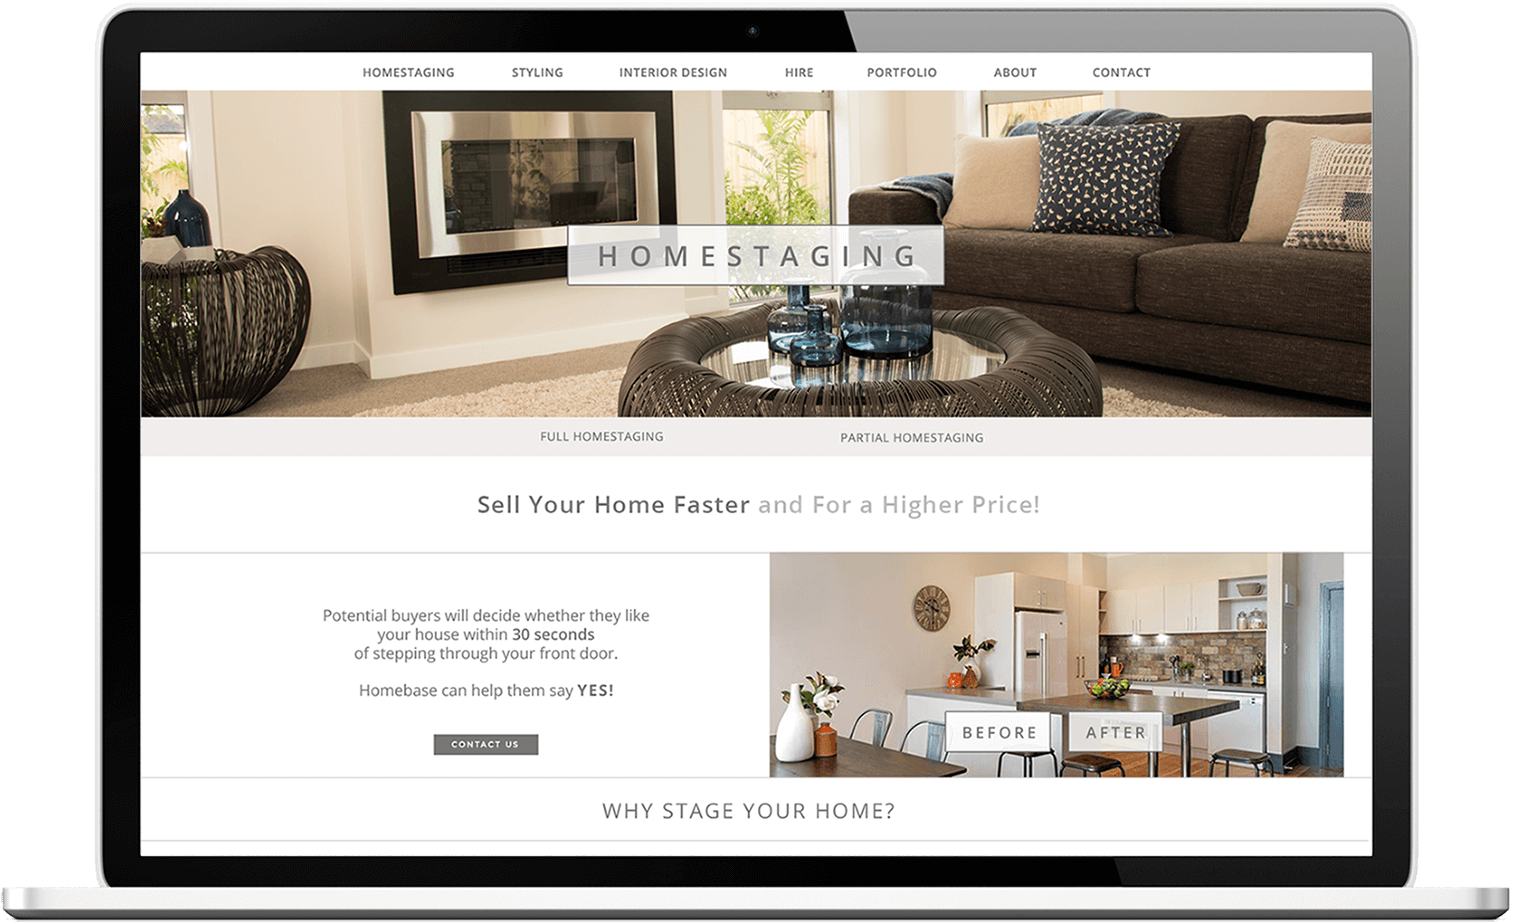 homebase view in laptop - Homebase